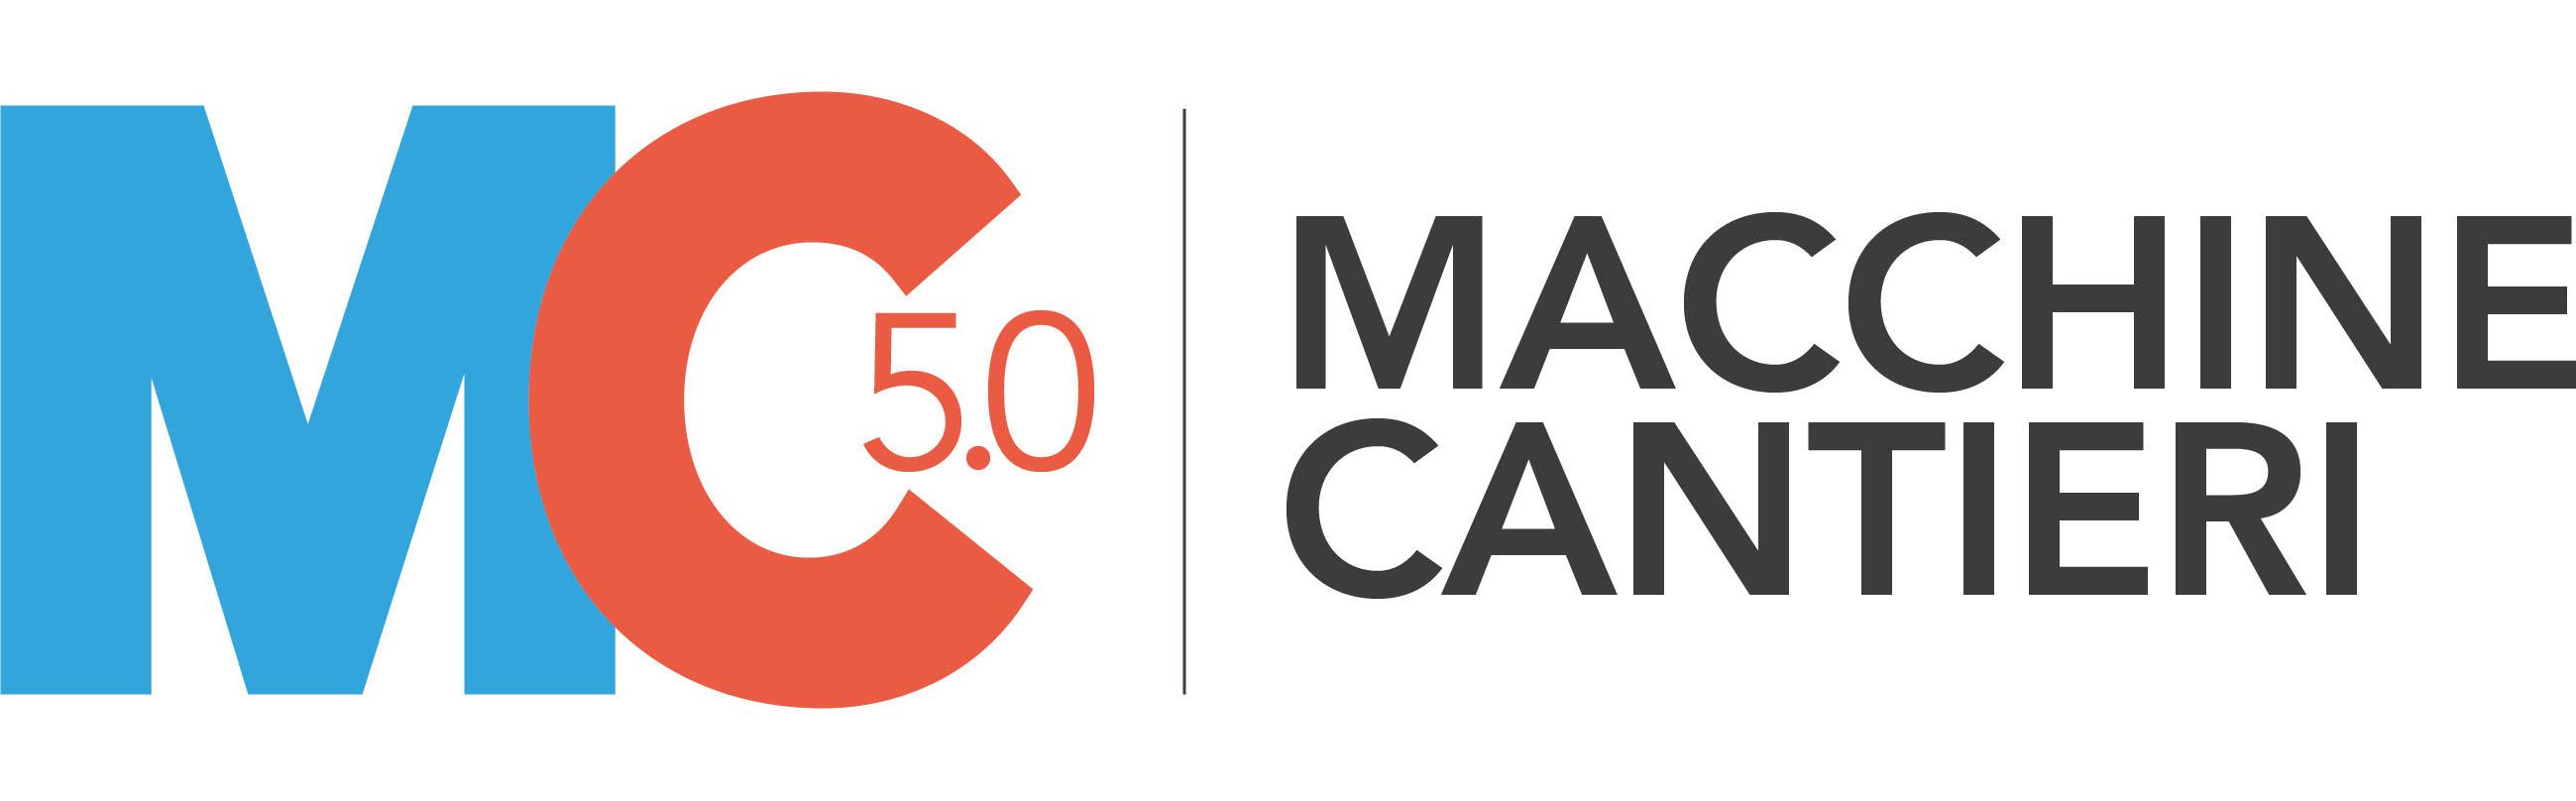 MC5.0-Macchine Cantieri Logo